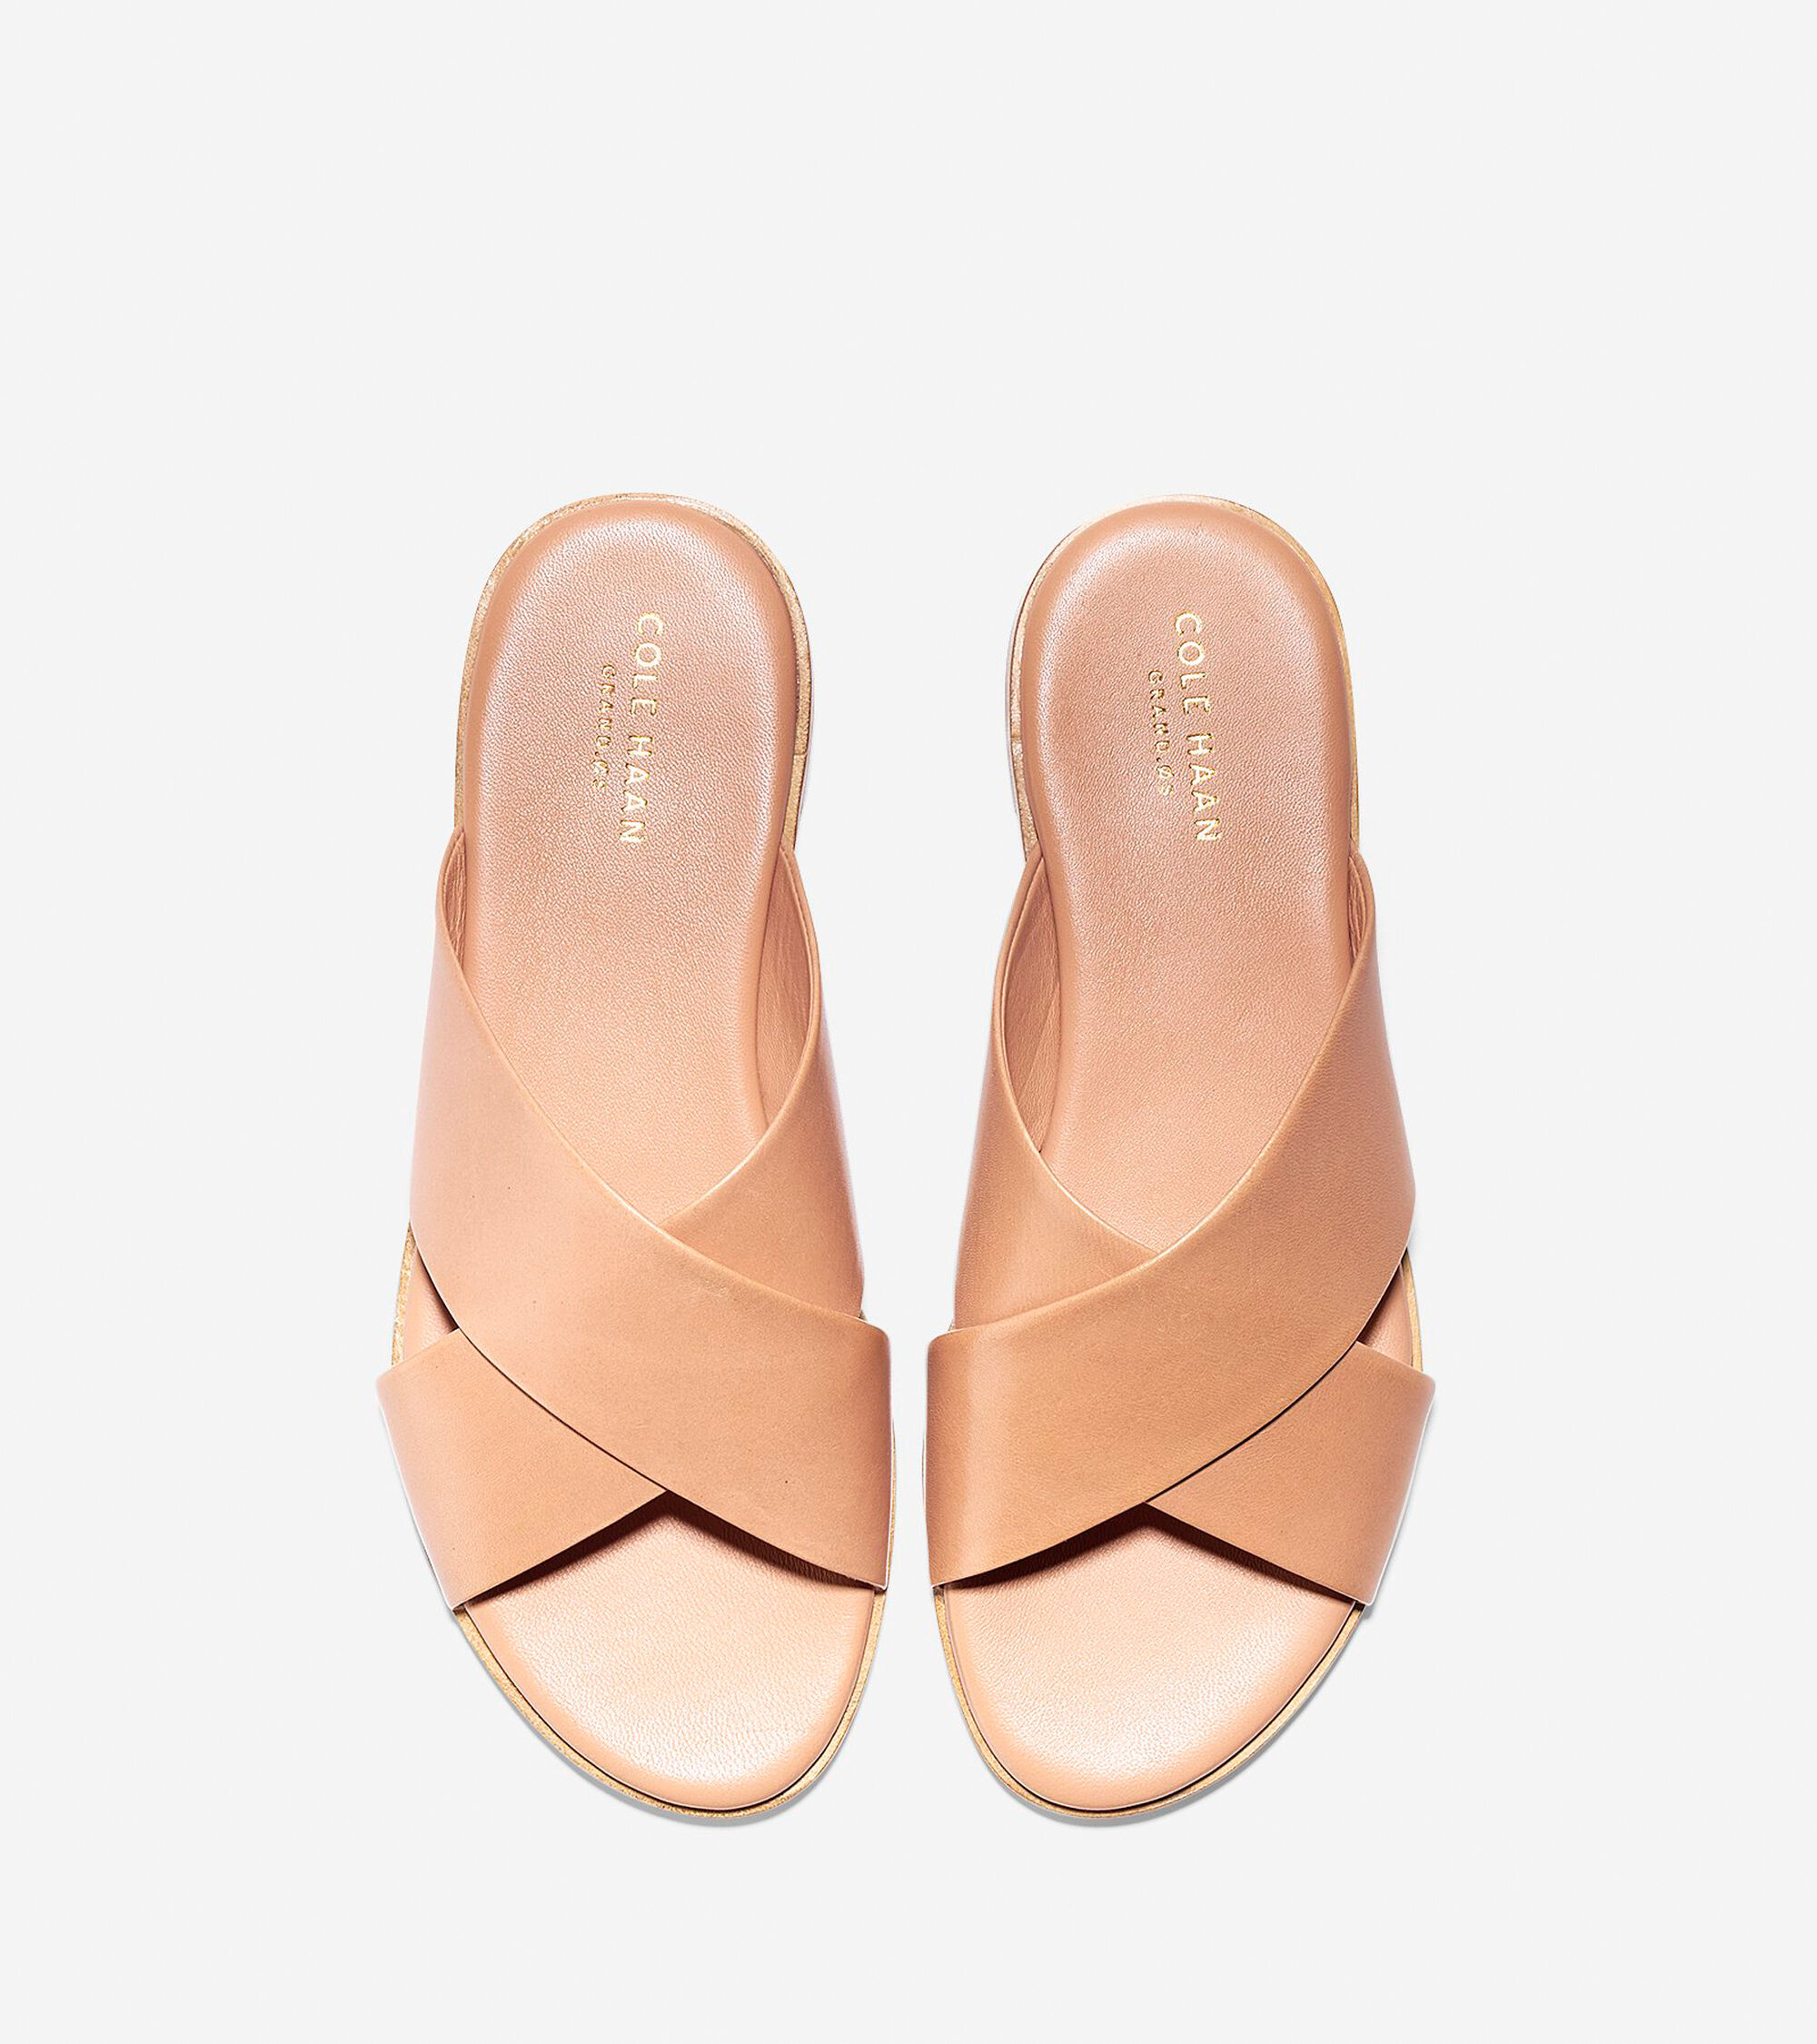 378e68bc26e Anica Criss Cross Sandals in Sahara Leather